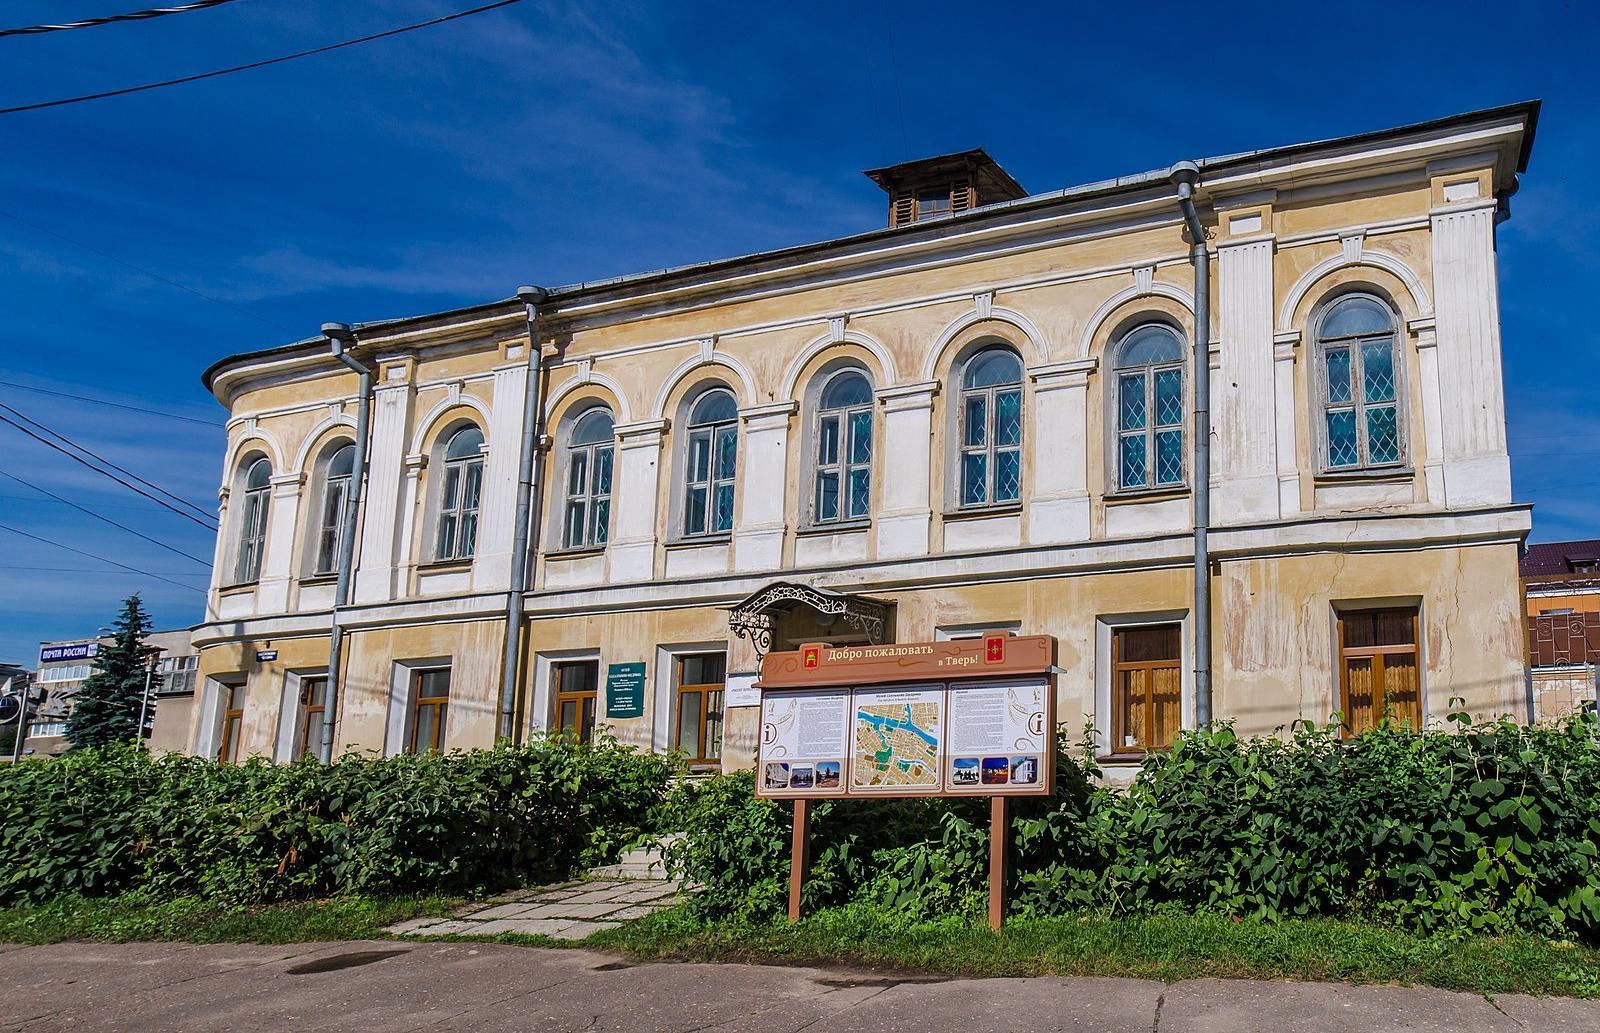 Игорь Руденя проверил ход реставрации музея Салтыкова-Щедрина в Твери - новости Афанасий